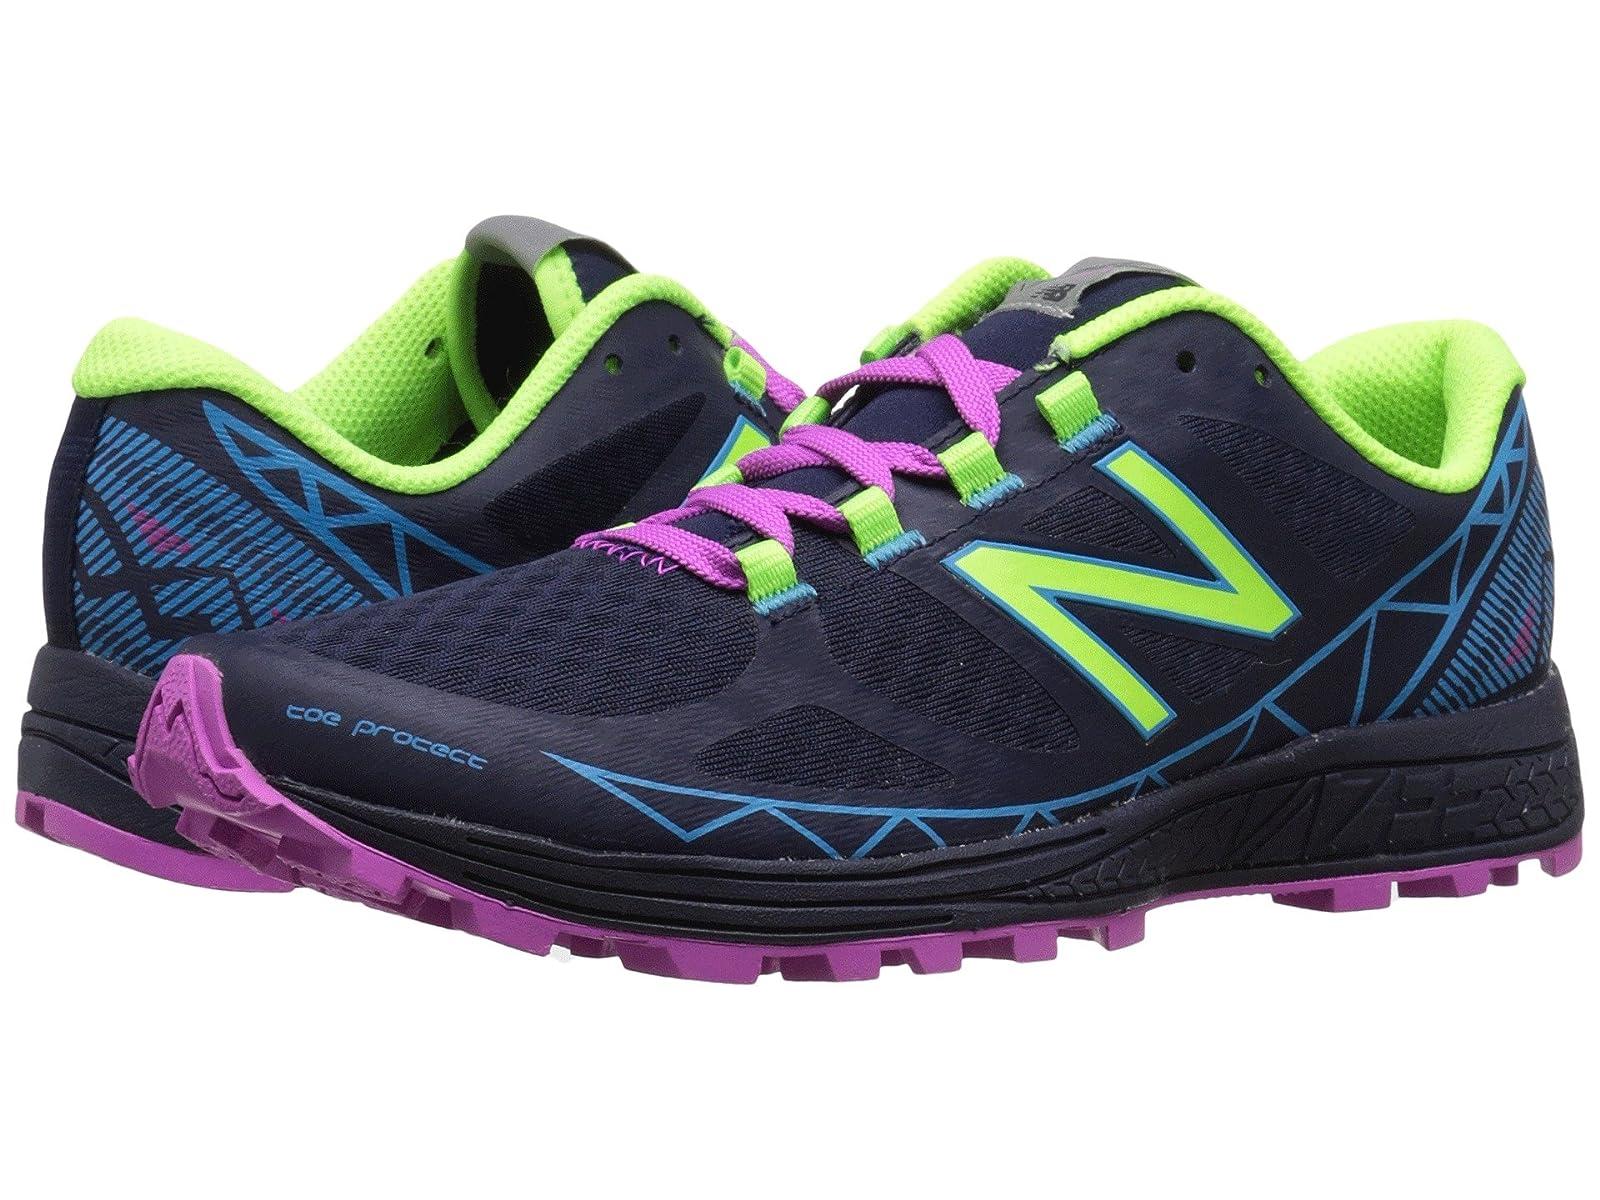 New Balance Vazee SummitCheap and distinctive eye-catching shoes